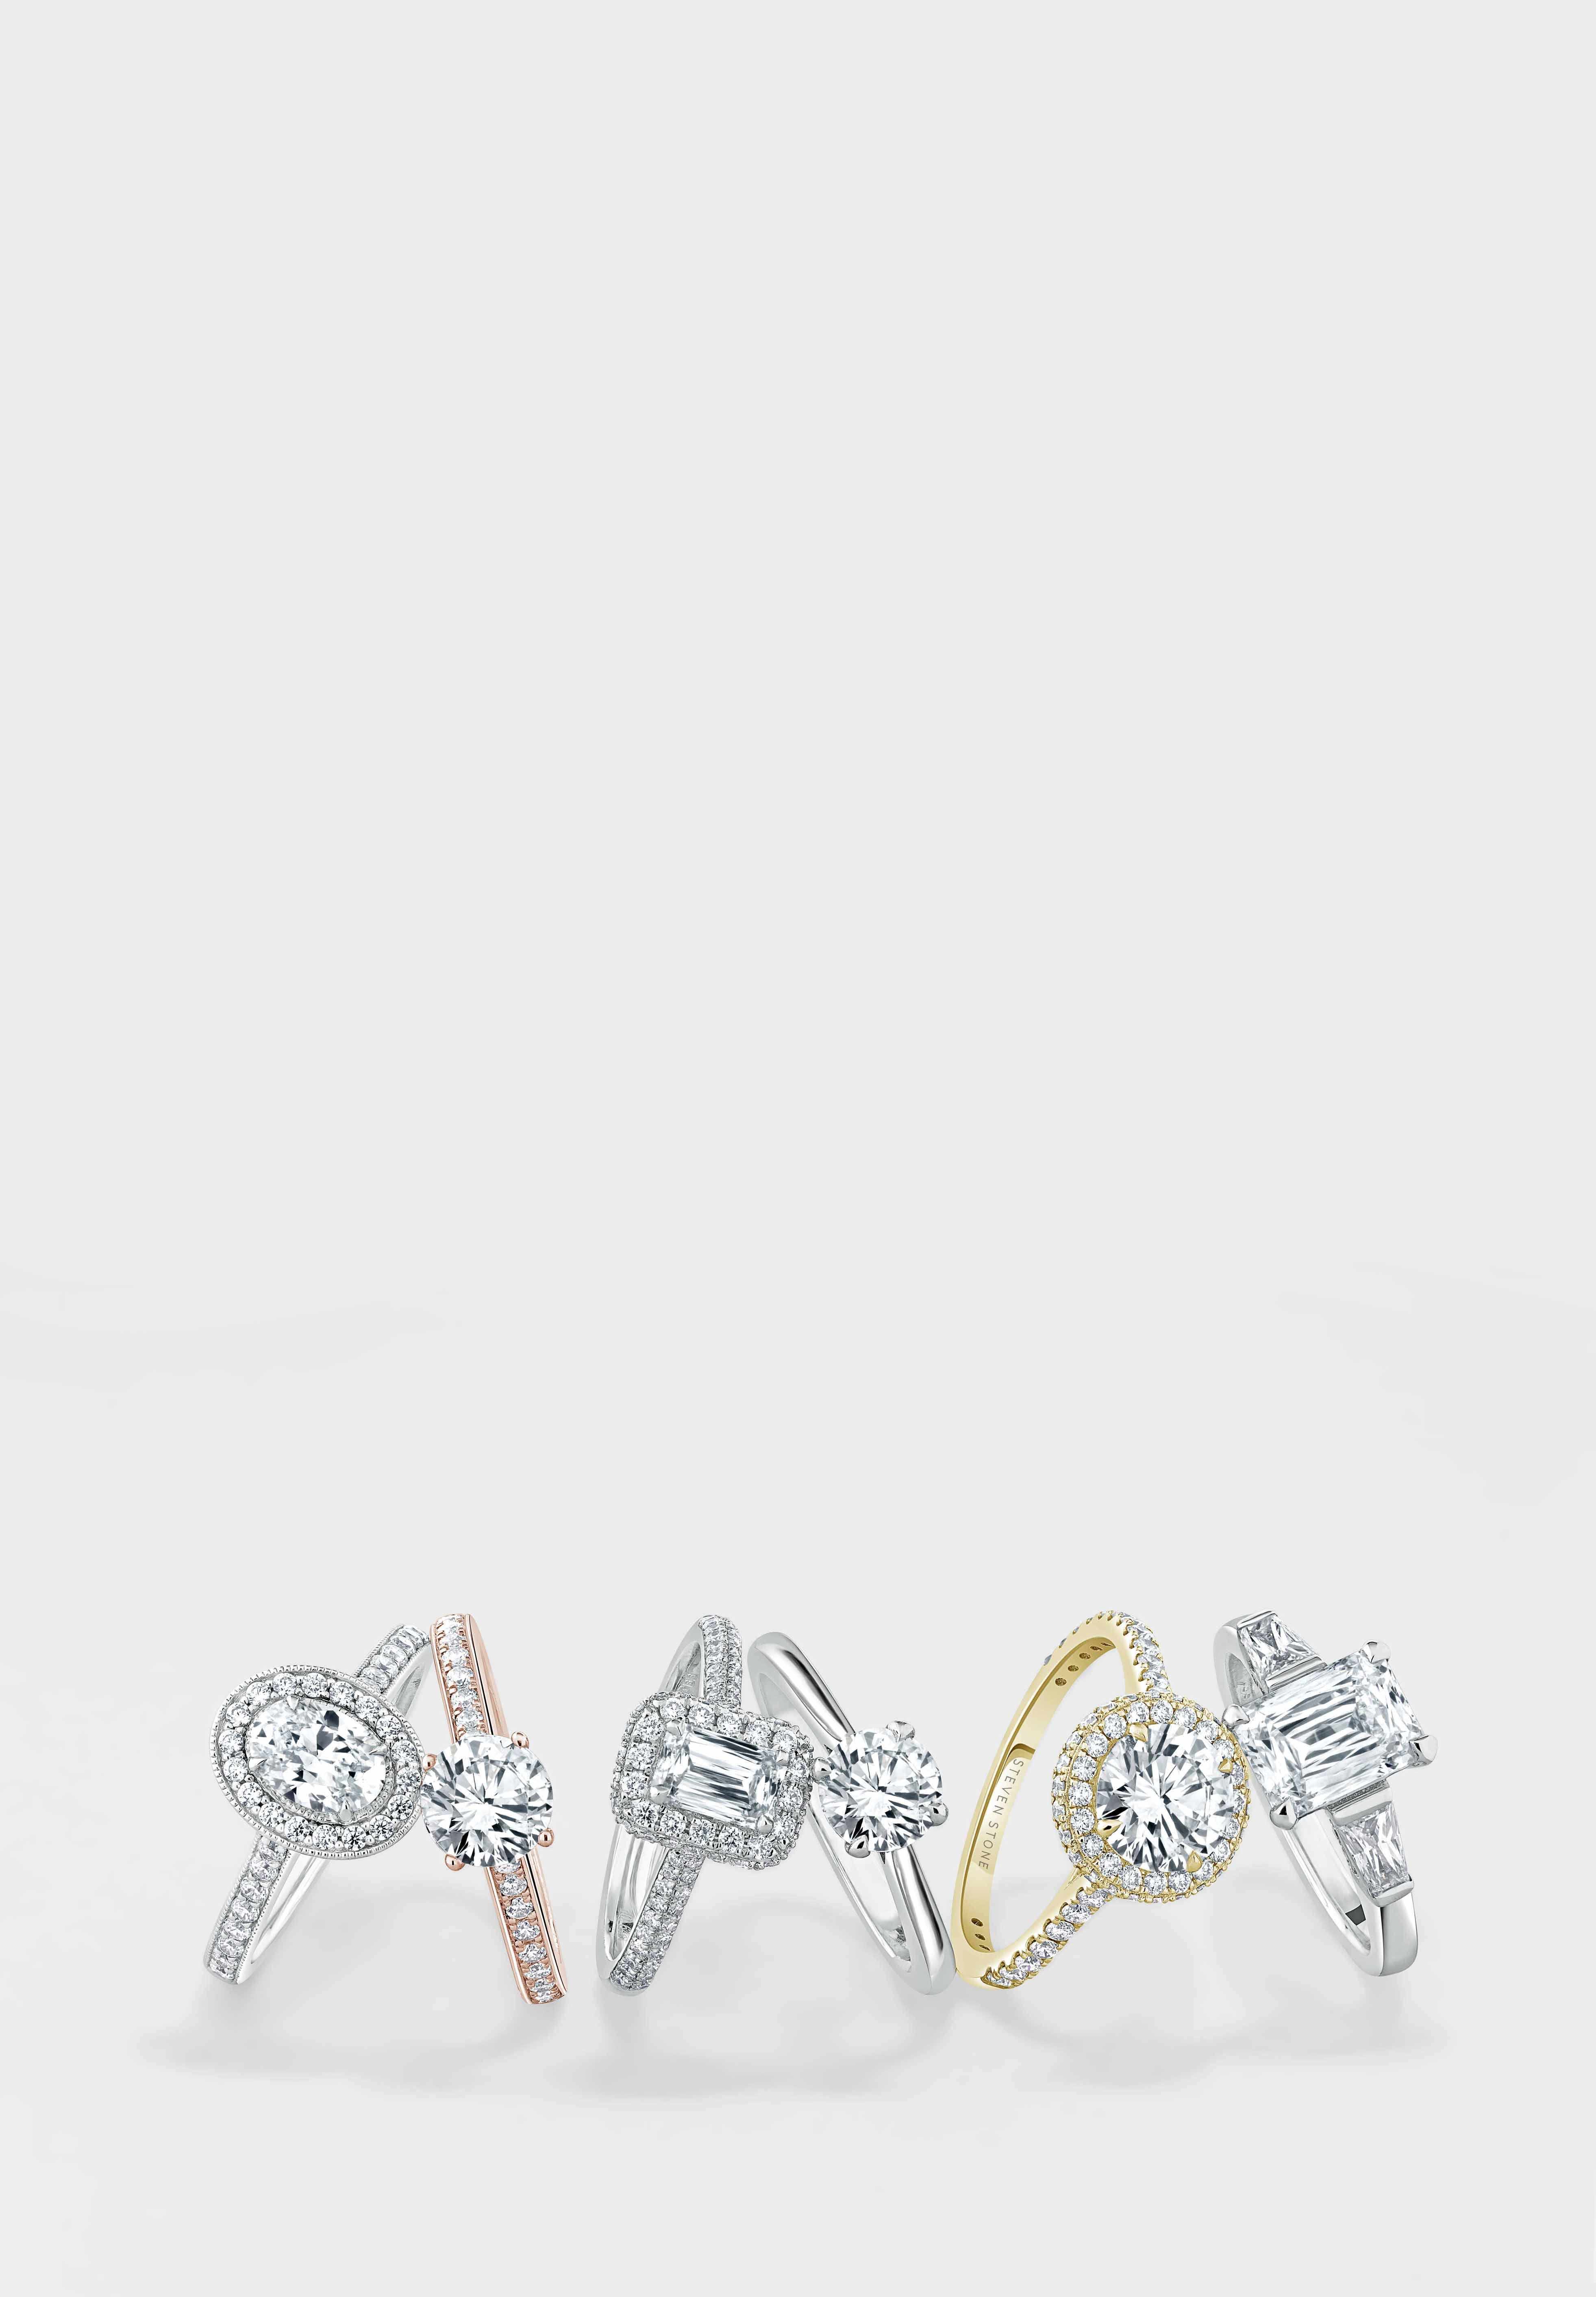 Yellow Gold Shoulder Set Engagement Rings - Steven Stone